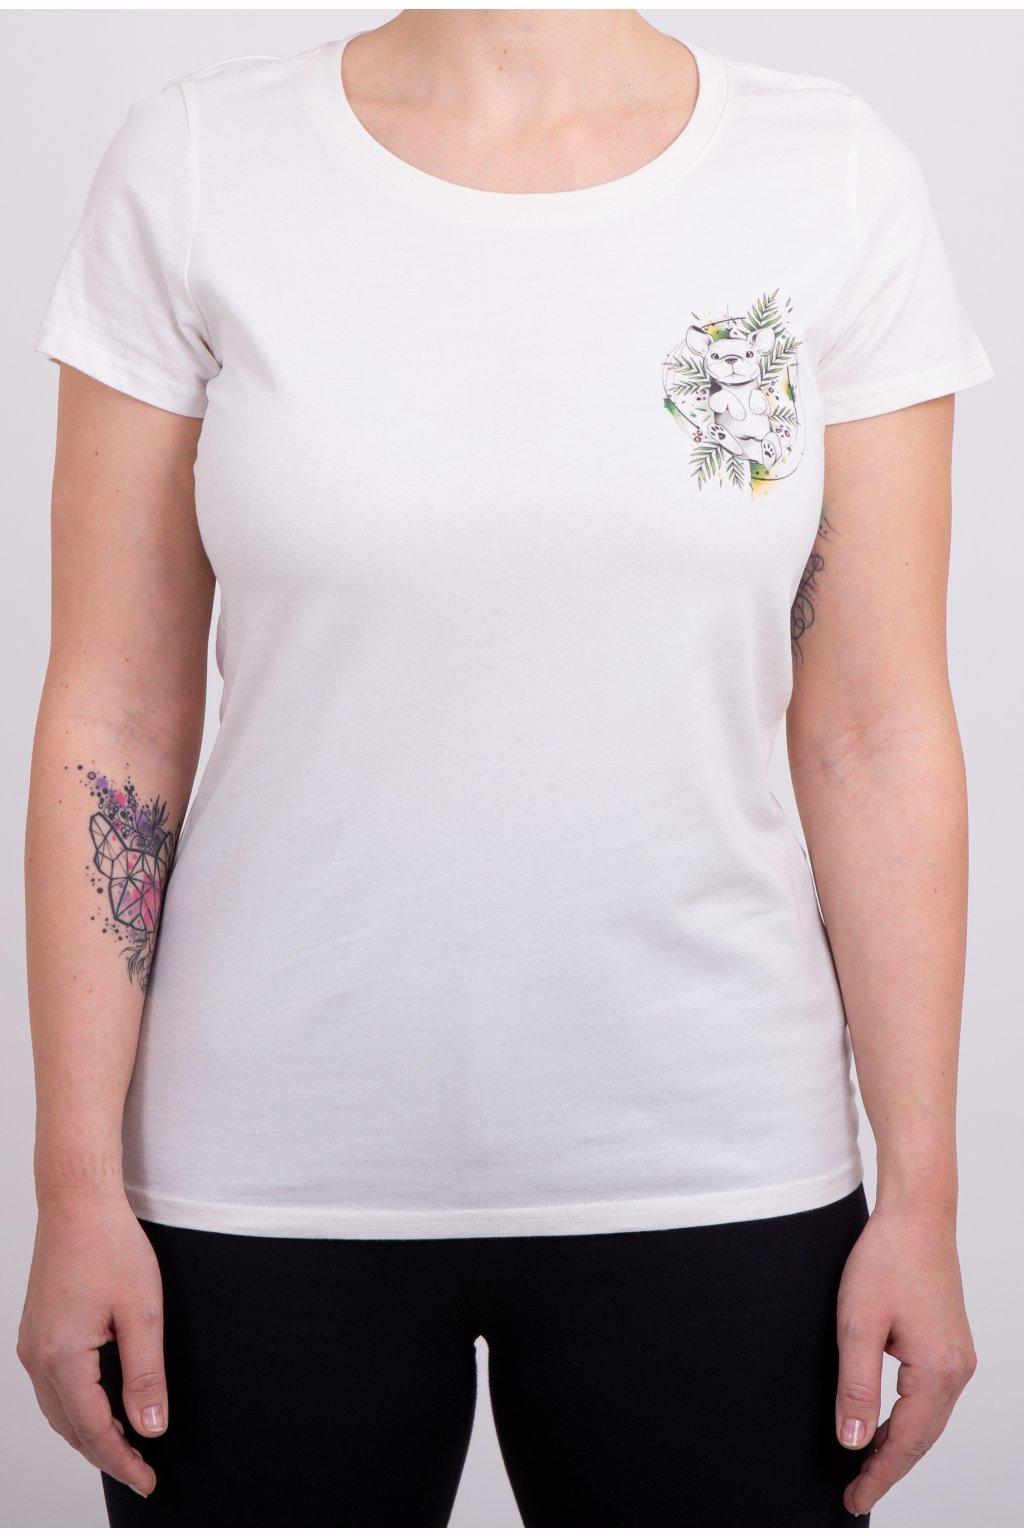 Dámské tričko PUPPY Winter white